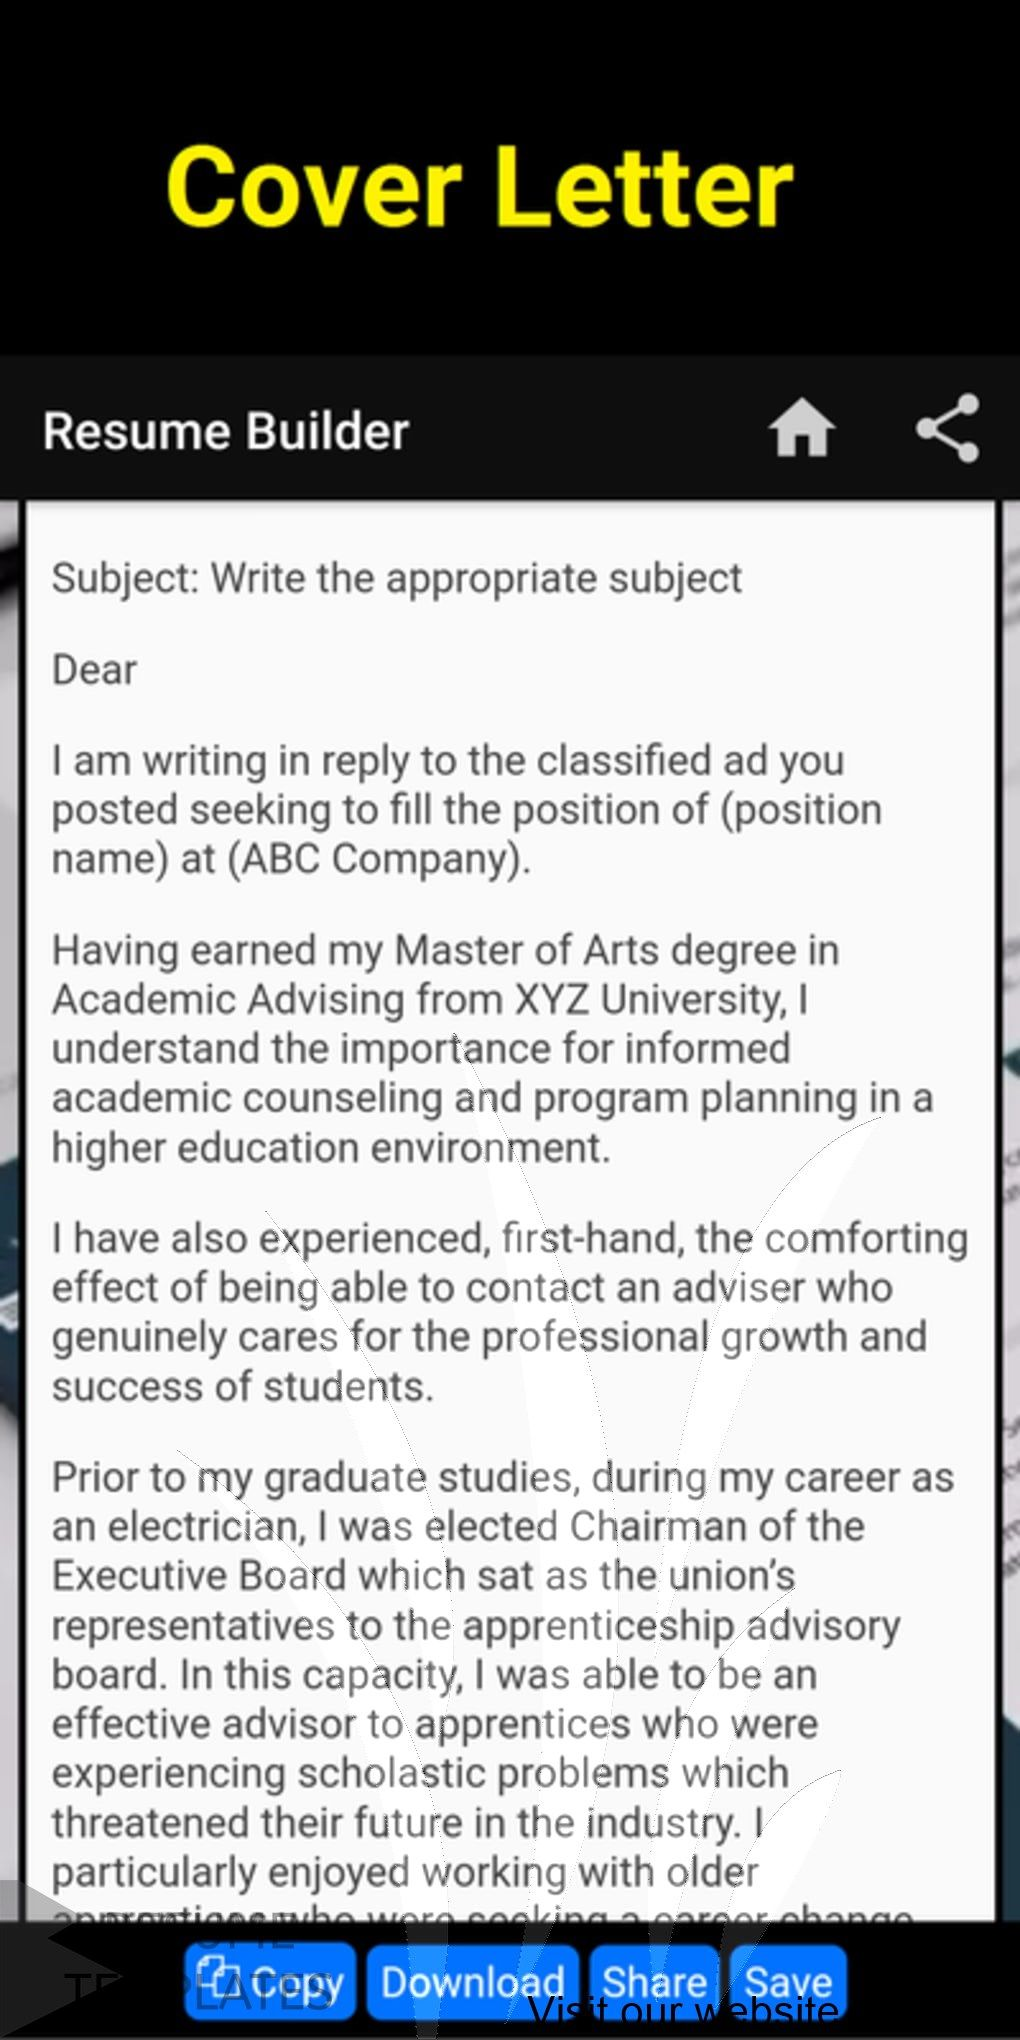 resume template free, resume template professional, resume